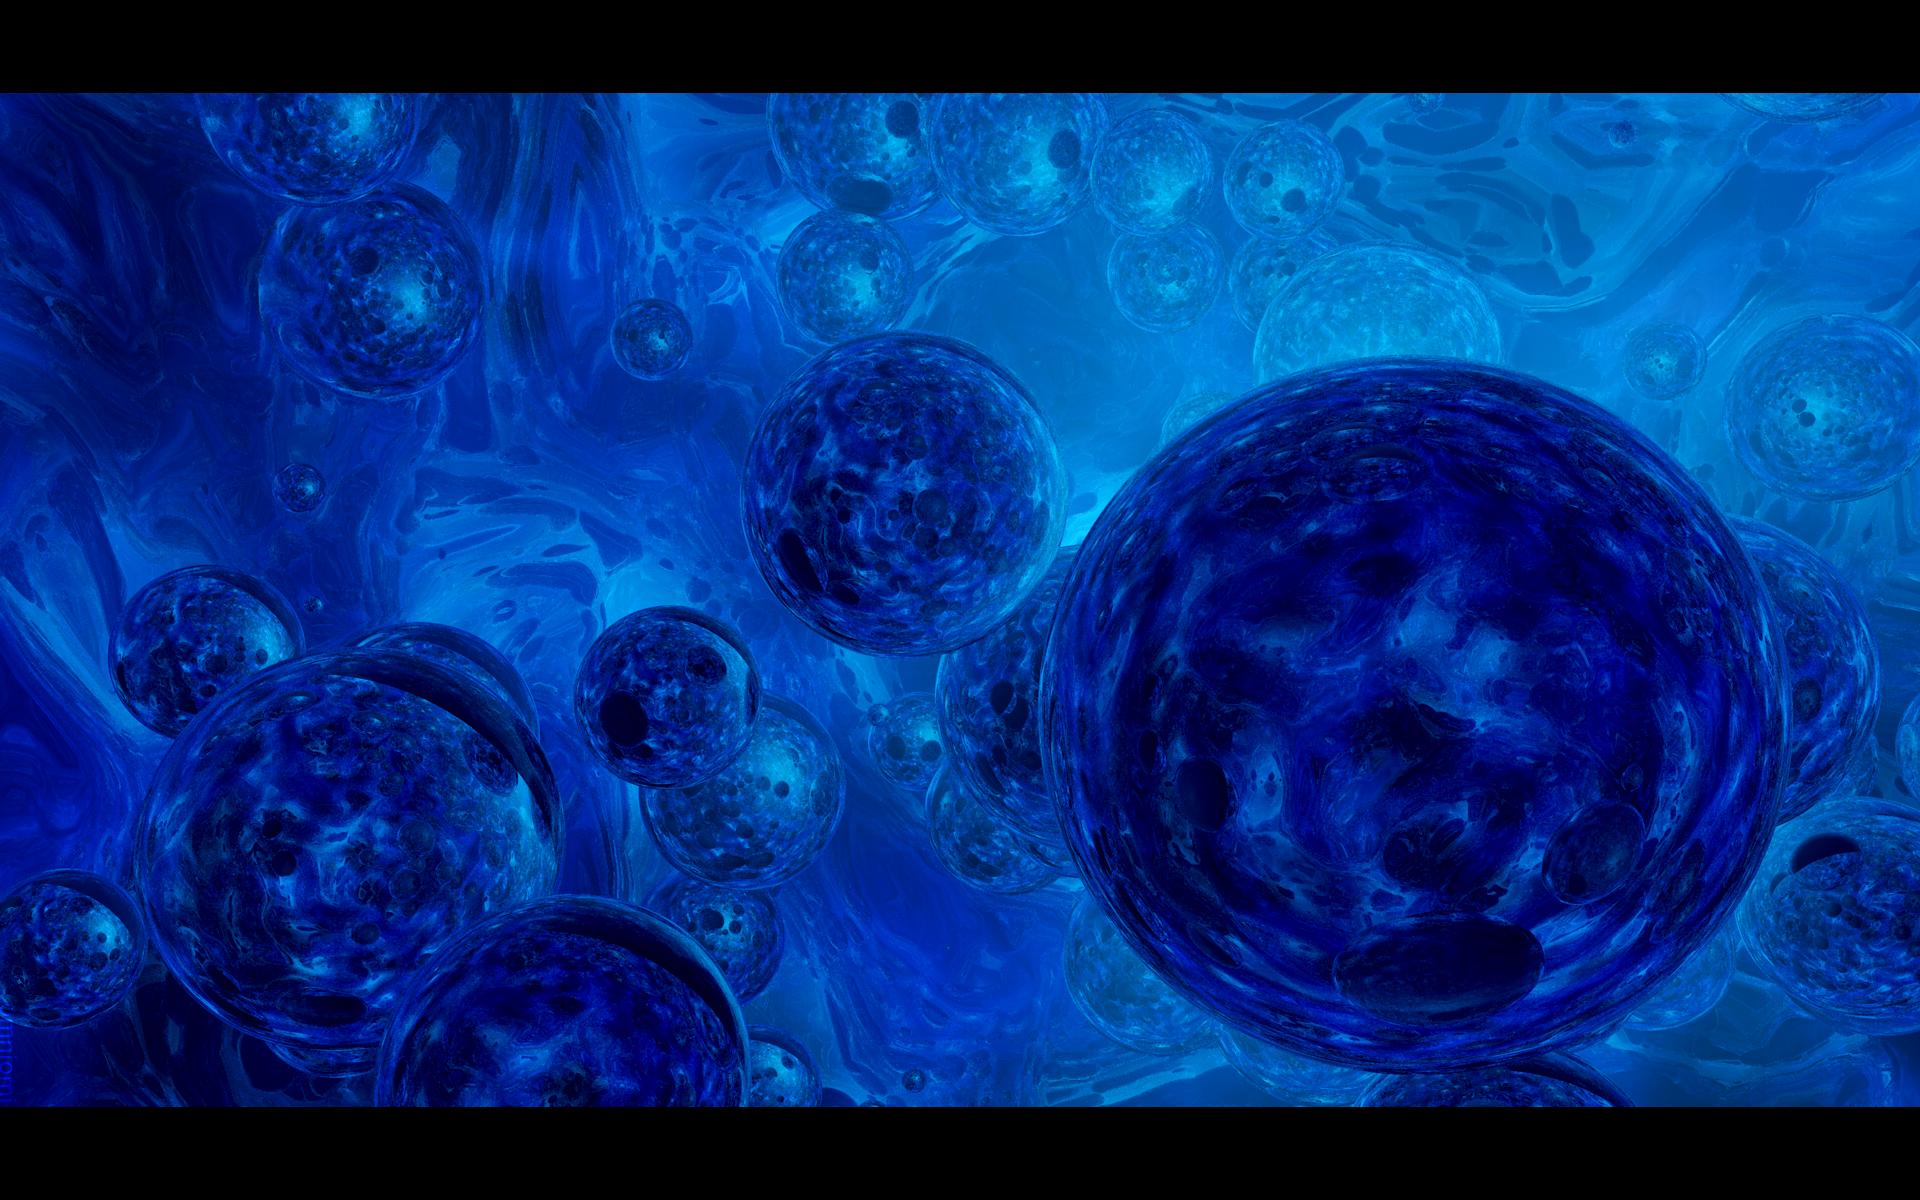 Bubbles 2 by omniomi